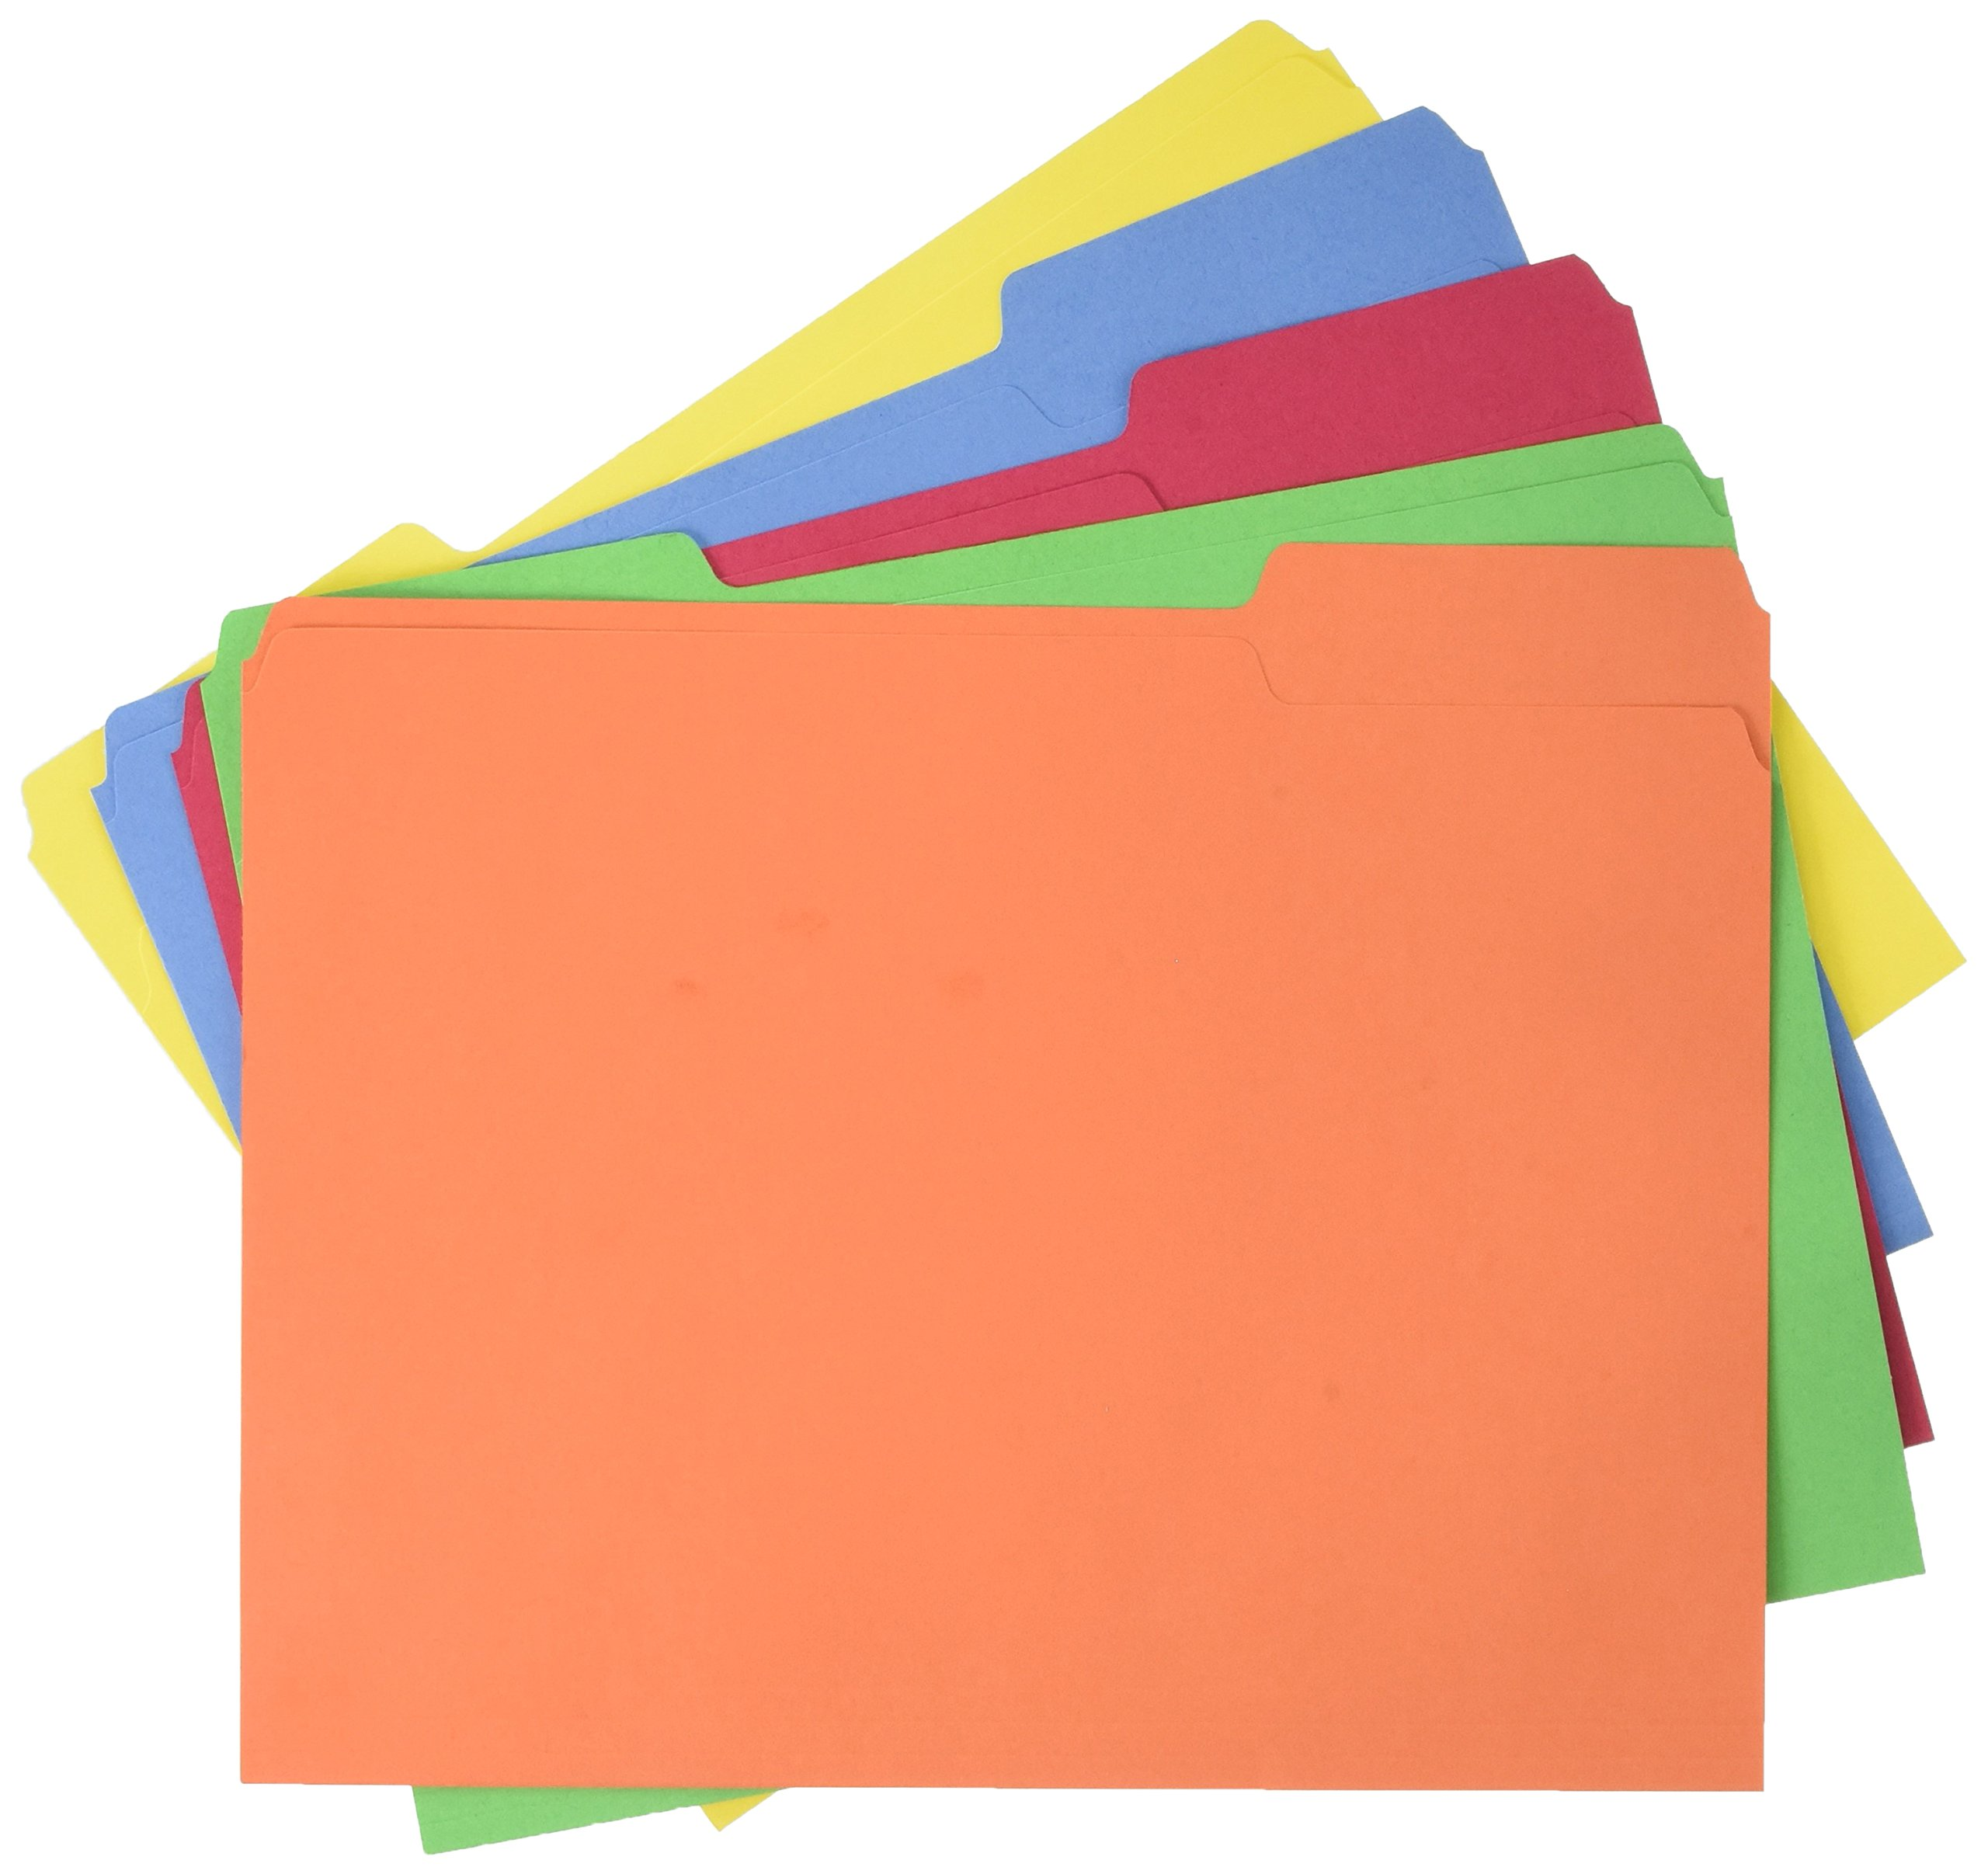 AmazonBasics AMZ401 File Folders - Letter Size (100 Pack) – Assorted Colors